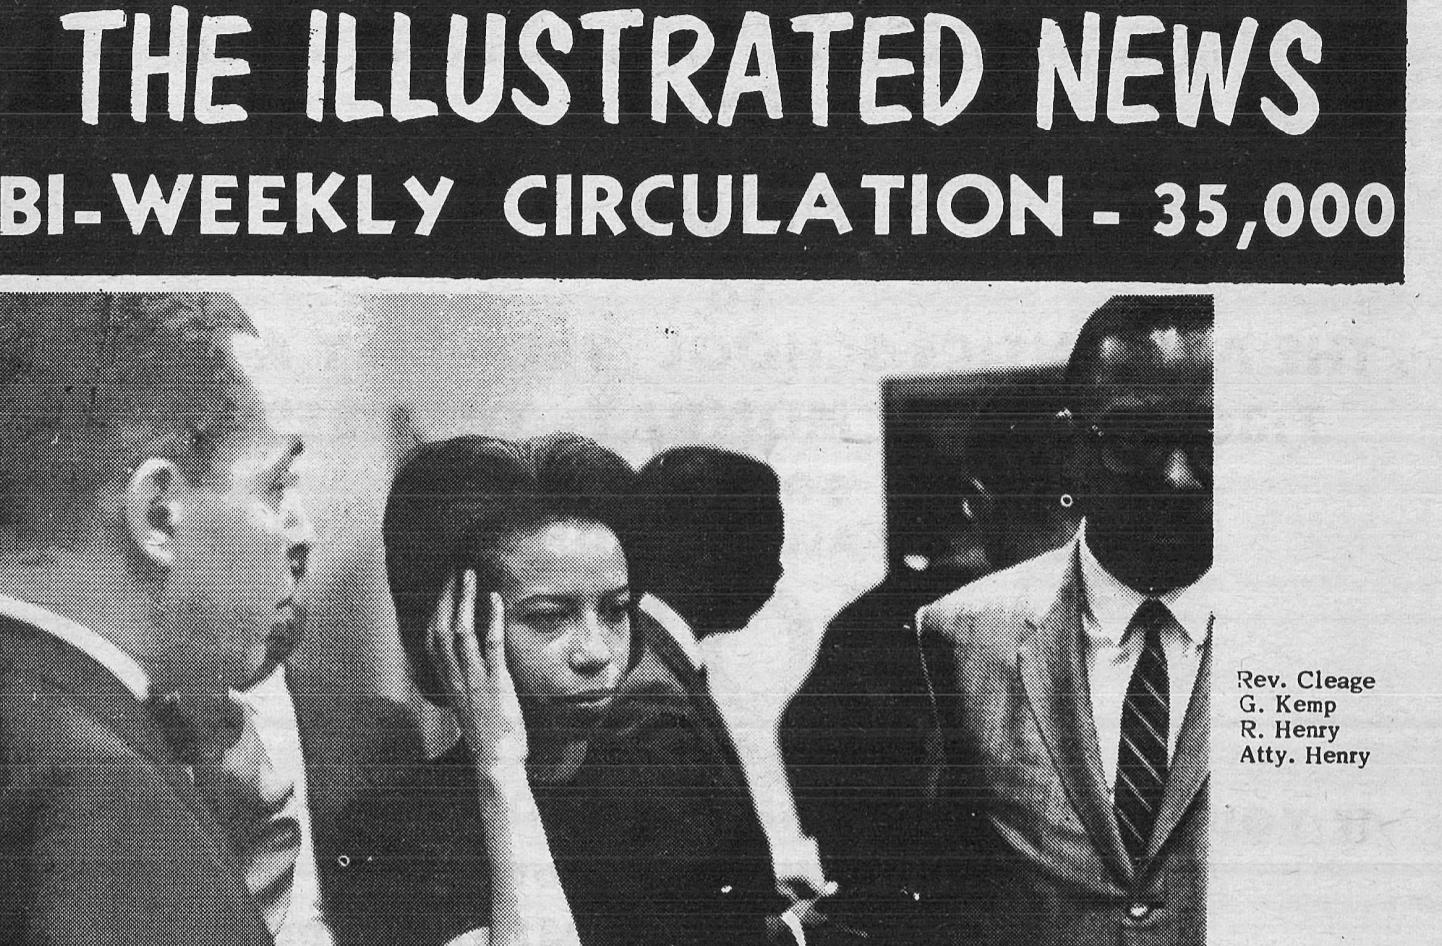 Illustrated News, Vol. 3, No. 22, October 28, 1963